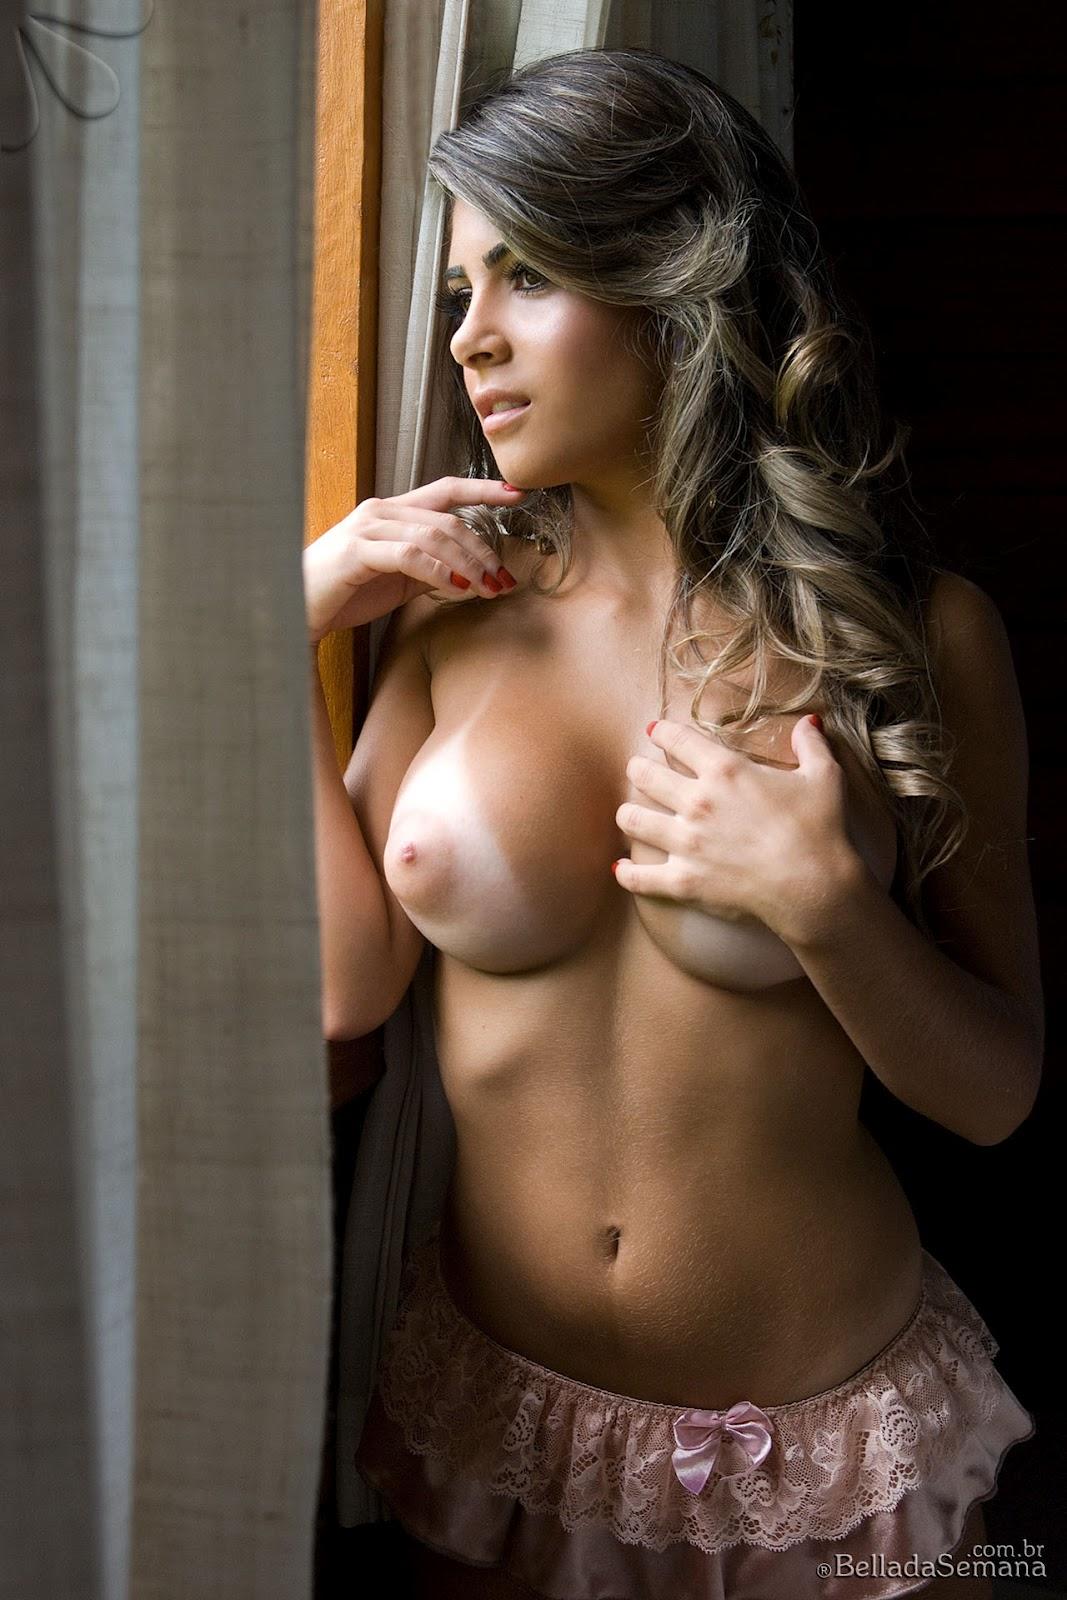 Paula rebello sexy brazilian 02 RedBust